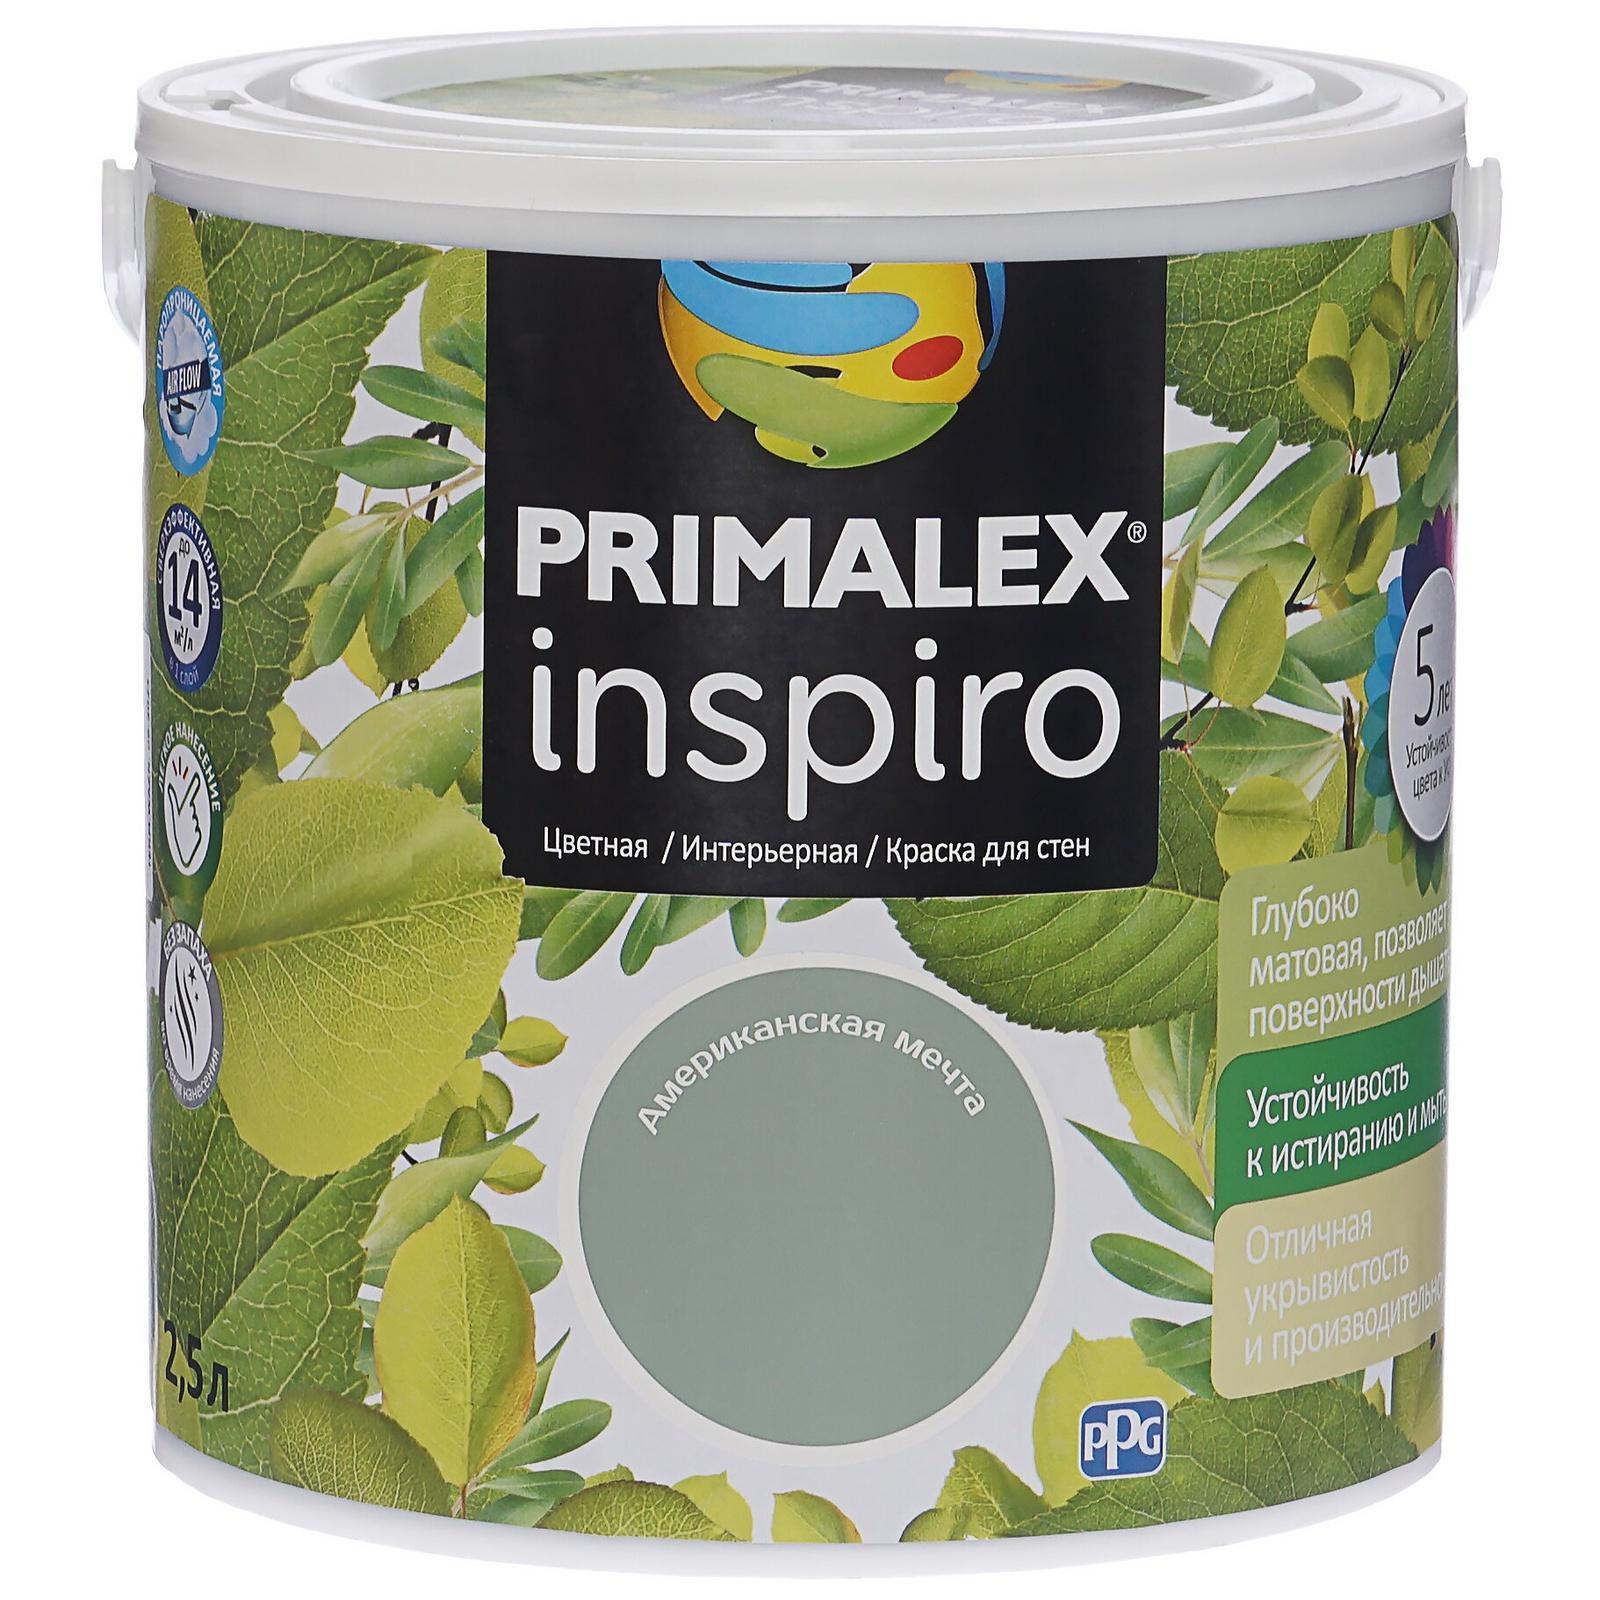 цена Краска PPG Primalex Inspiro Американская Мечта 2,5л, 420191 онлайн в 2017 году